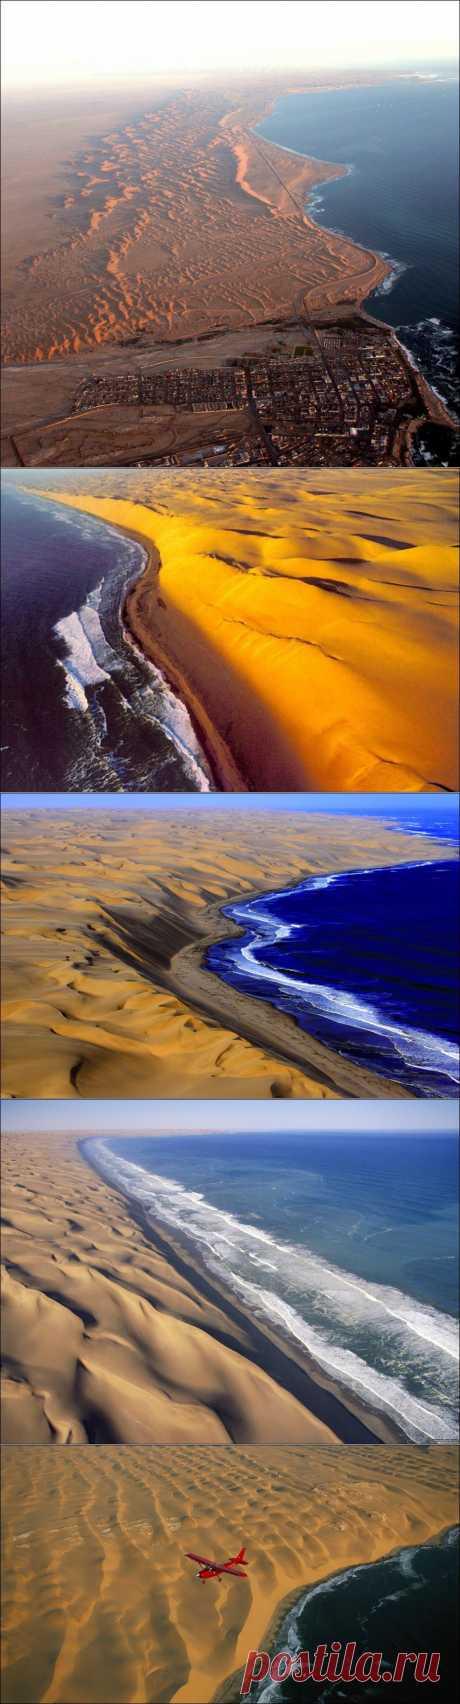 Два океана (10 фото) | Прикол.ру — приколы, картинки, фотки и розыгрыши!